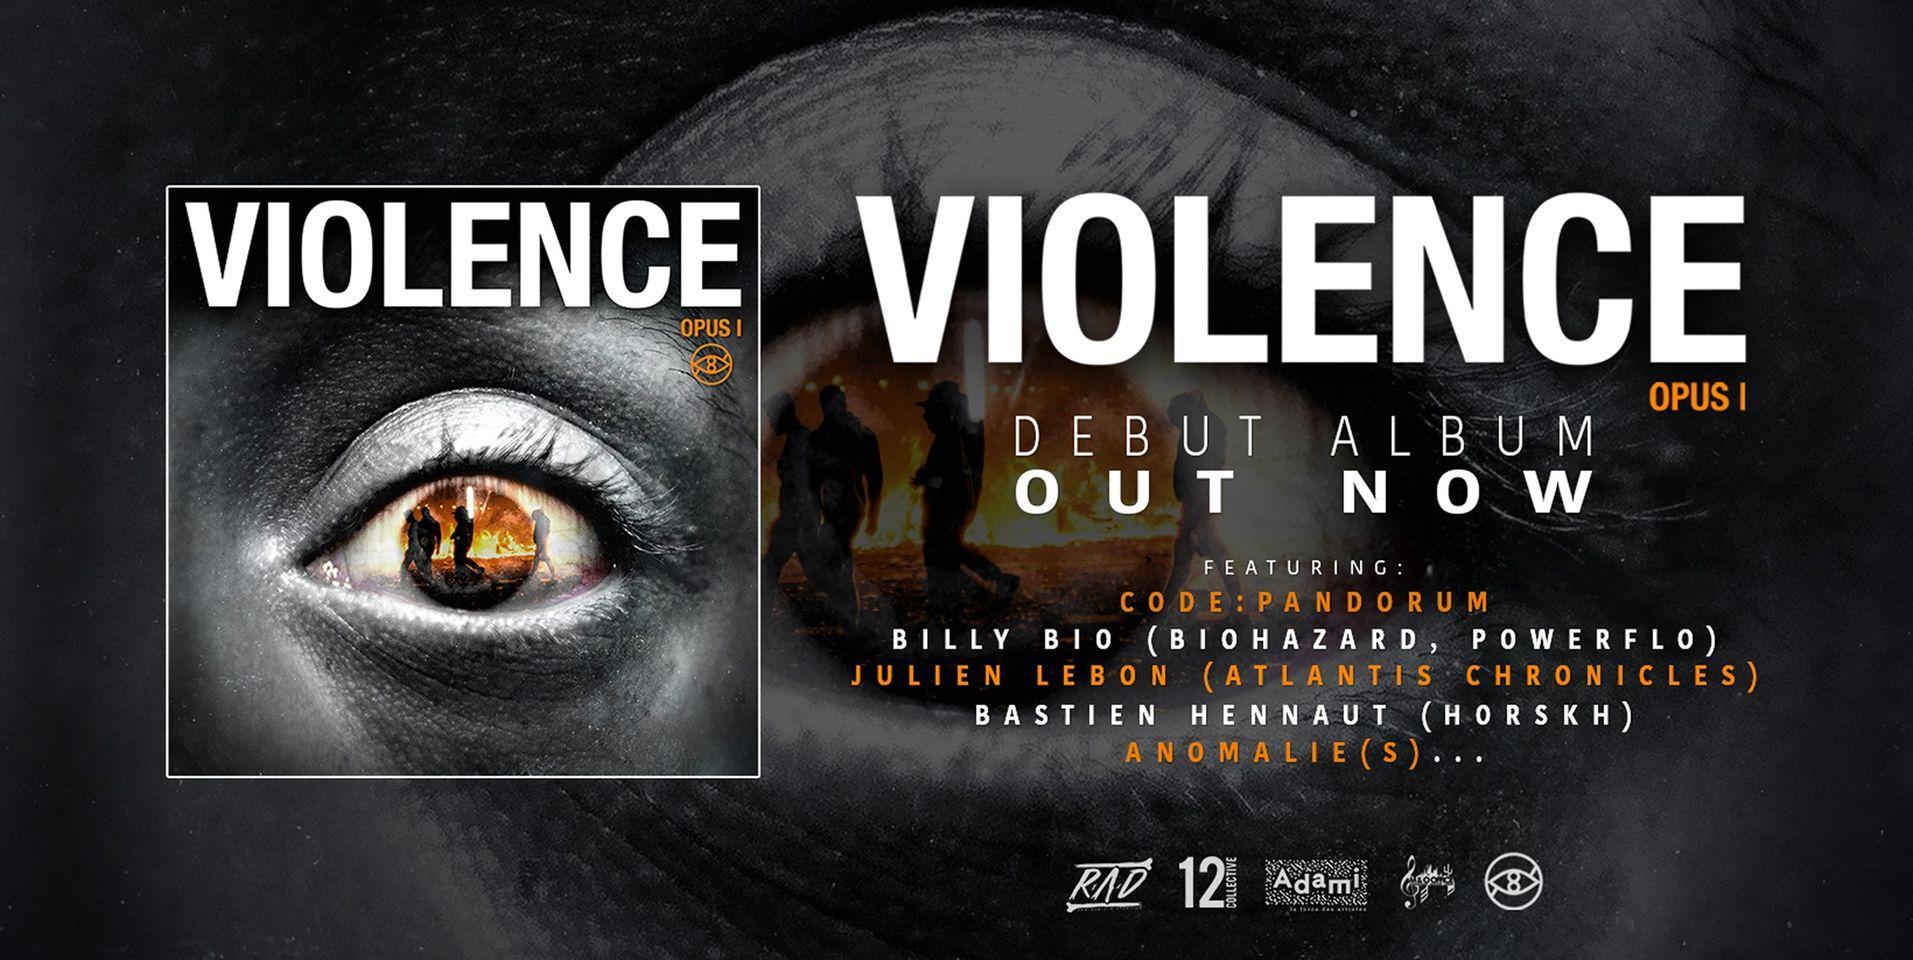 Violence guest